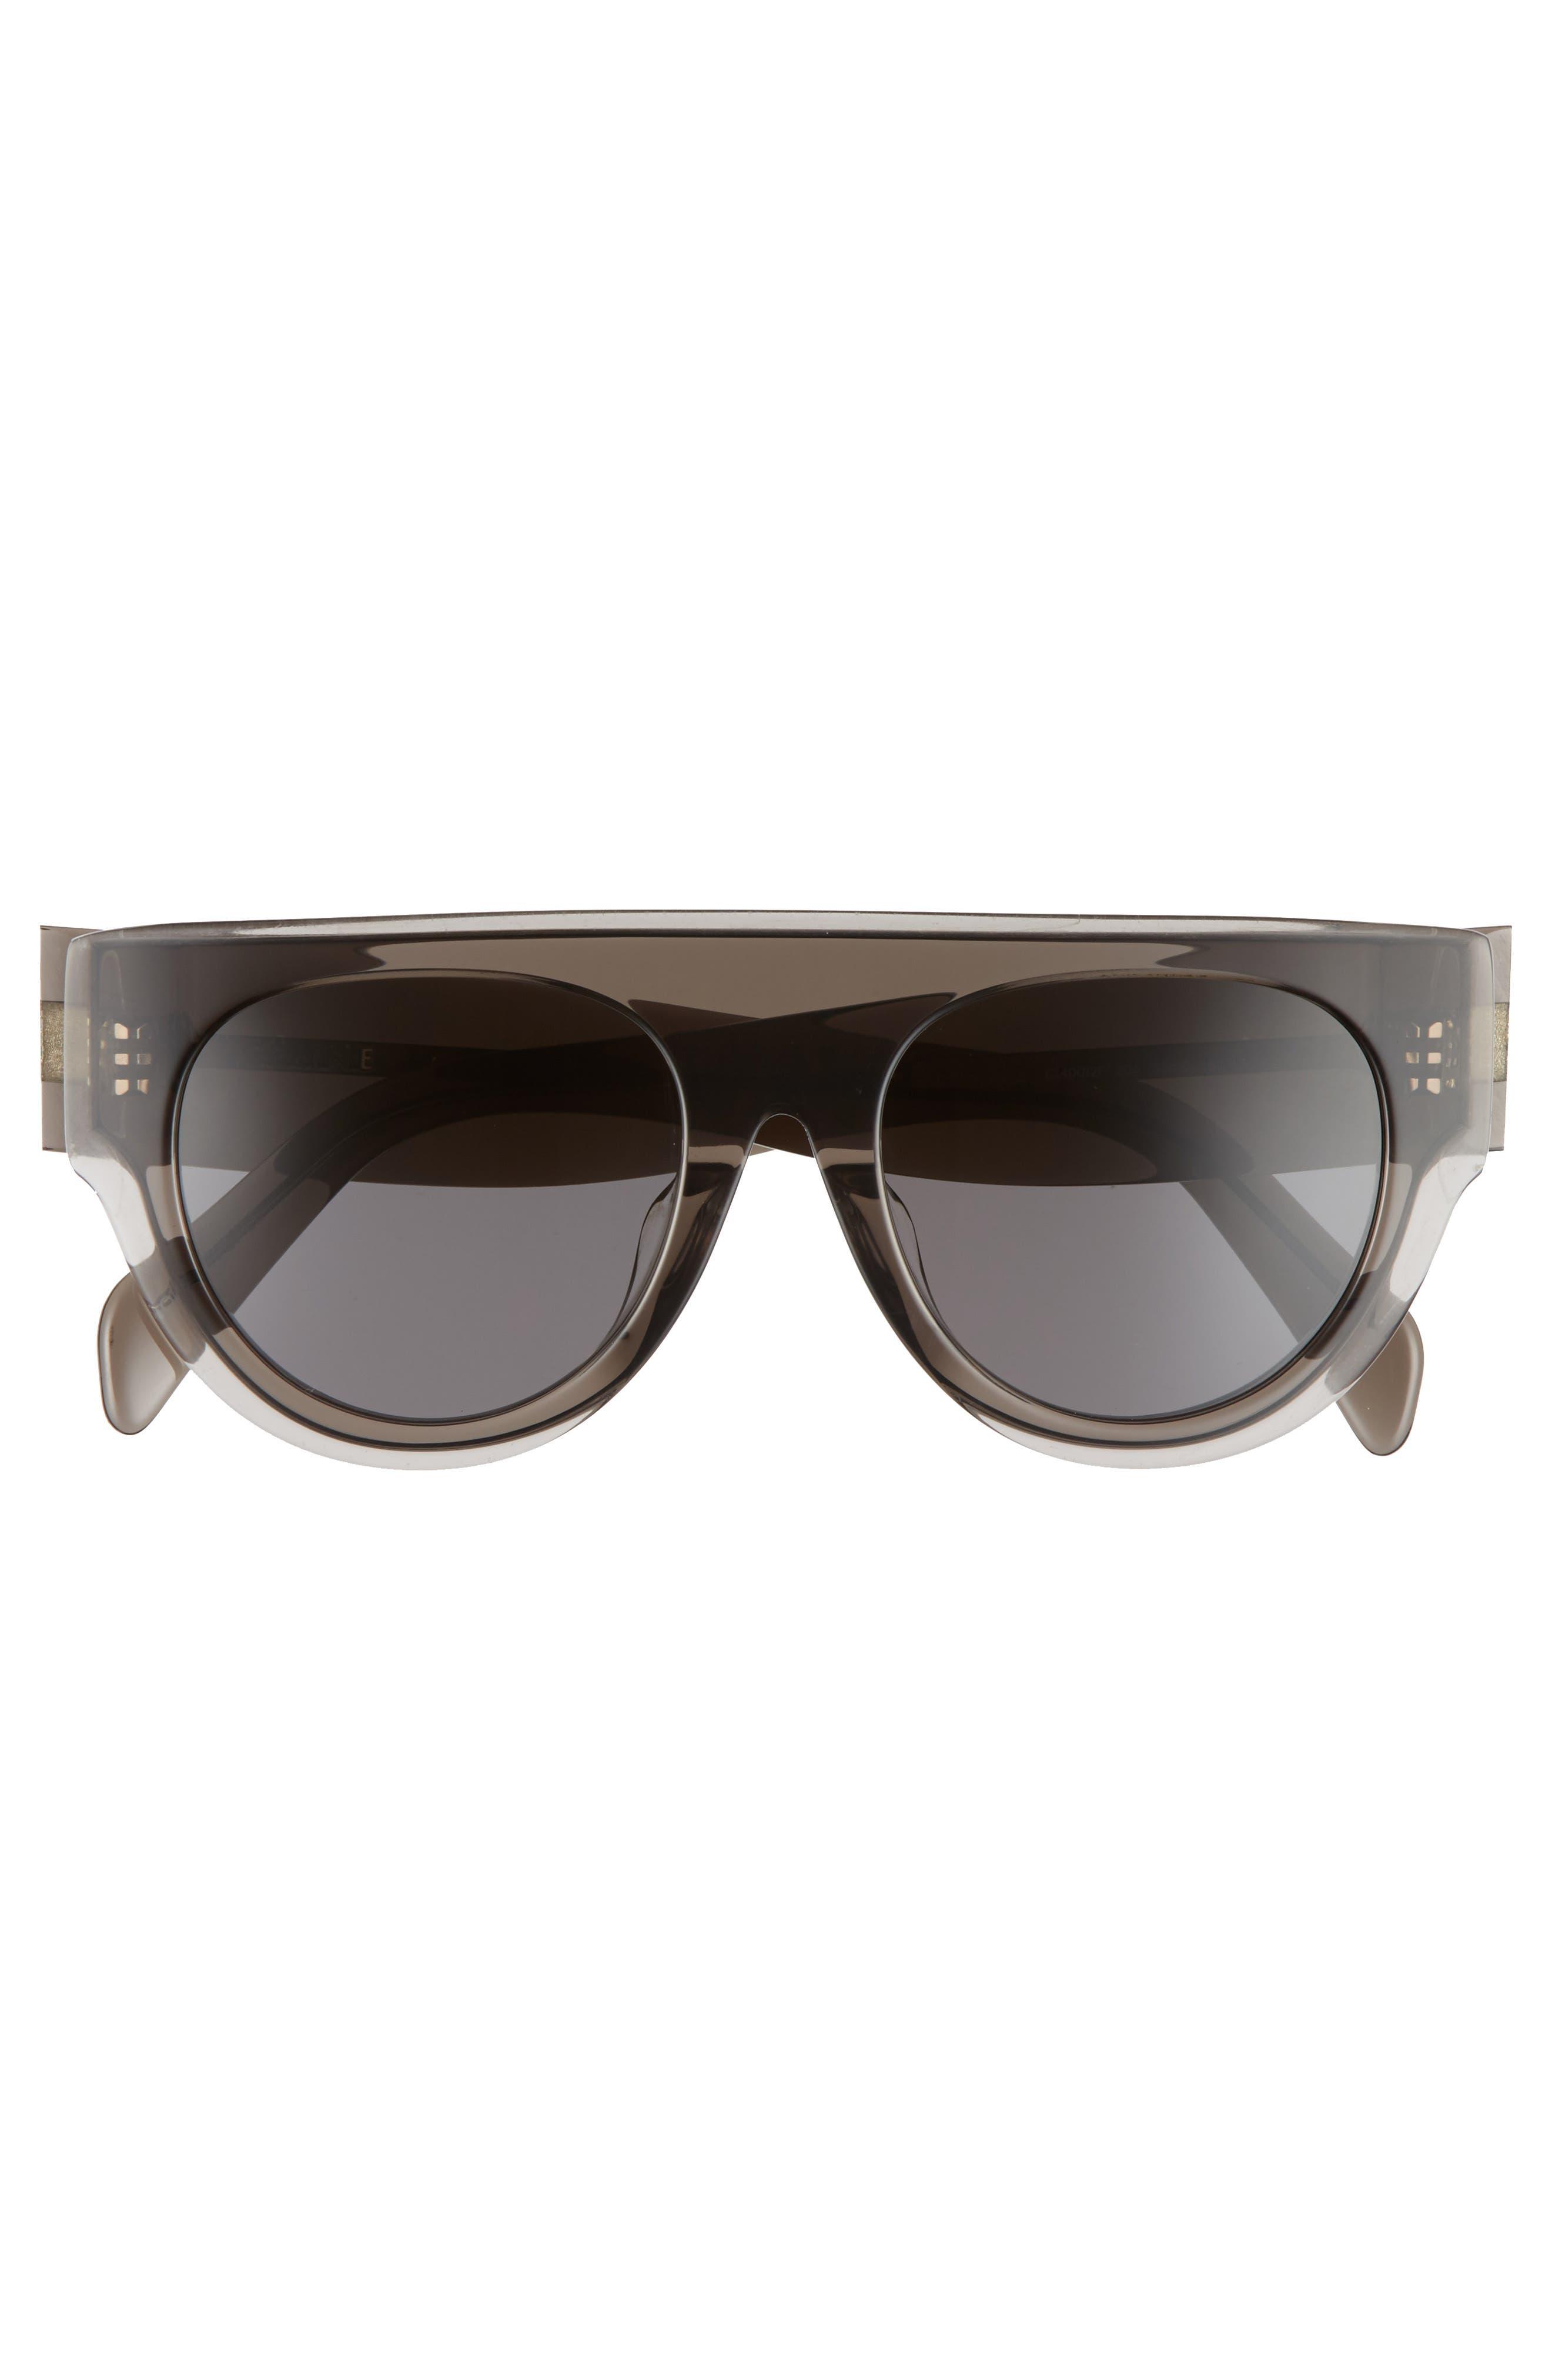 52mm Pilot Sunglasses,                             Alternate thumbnail 3, color,                             DARK GREY/ SMOKE